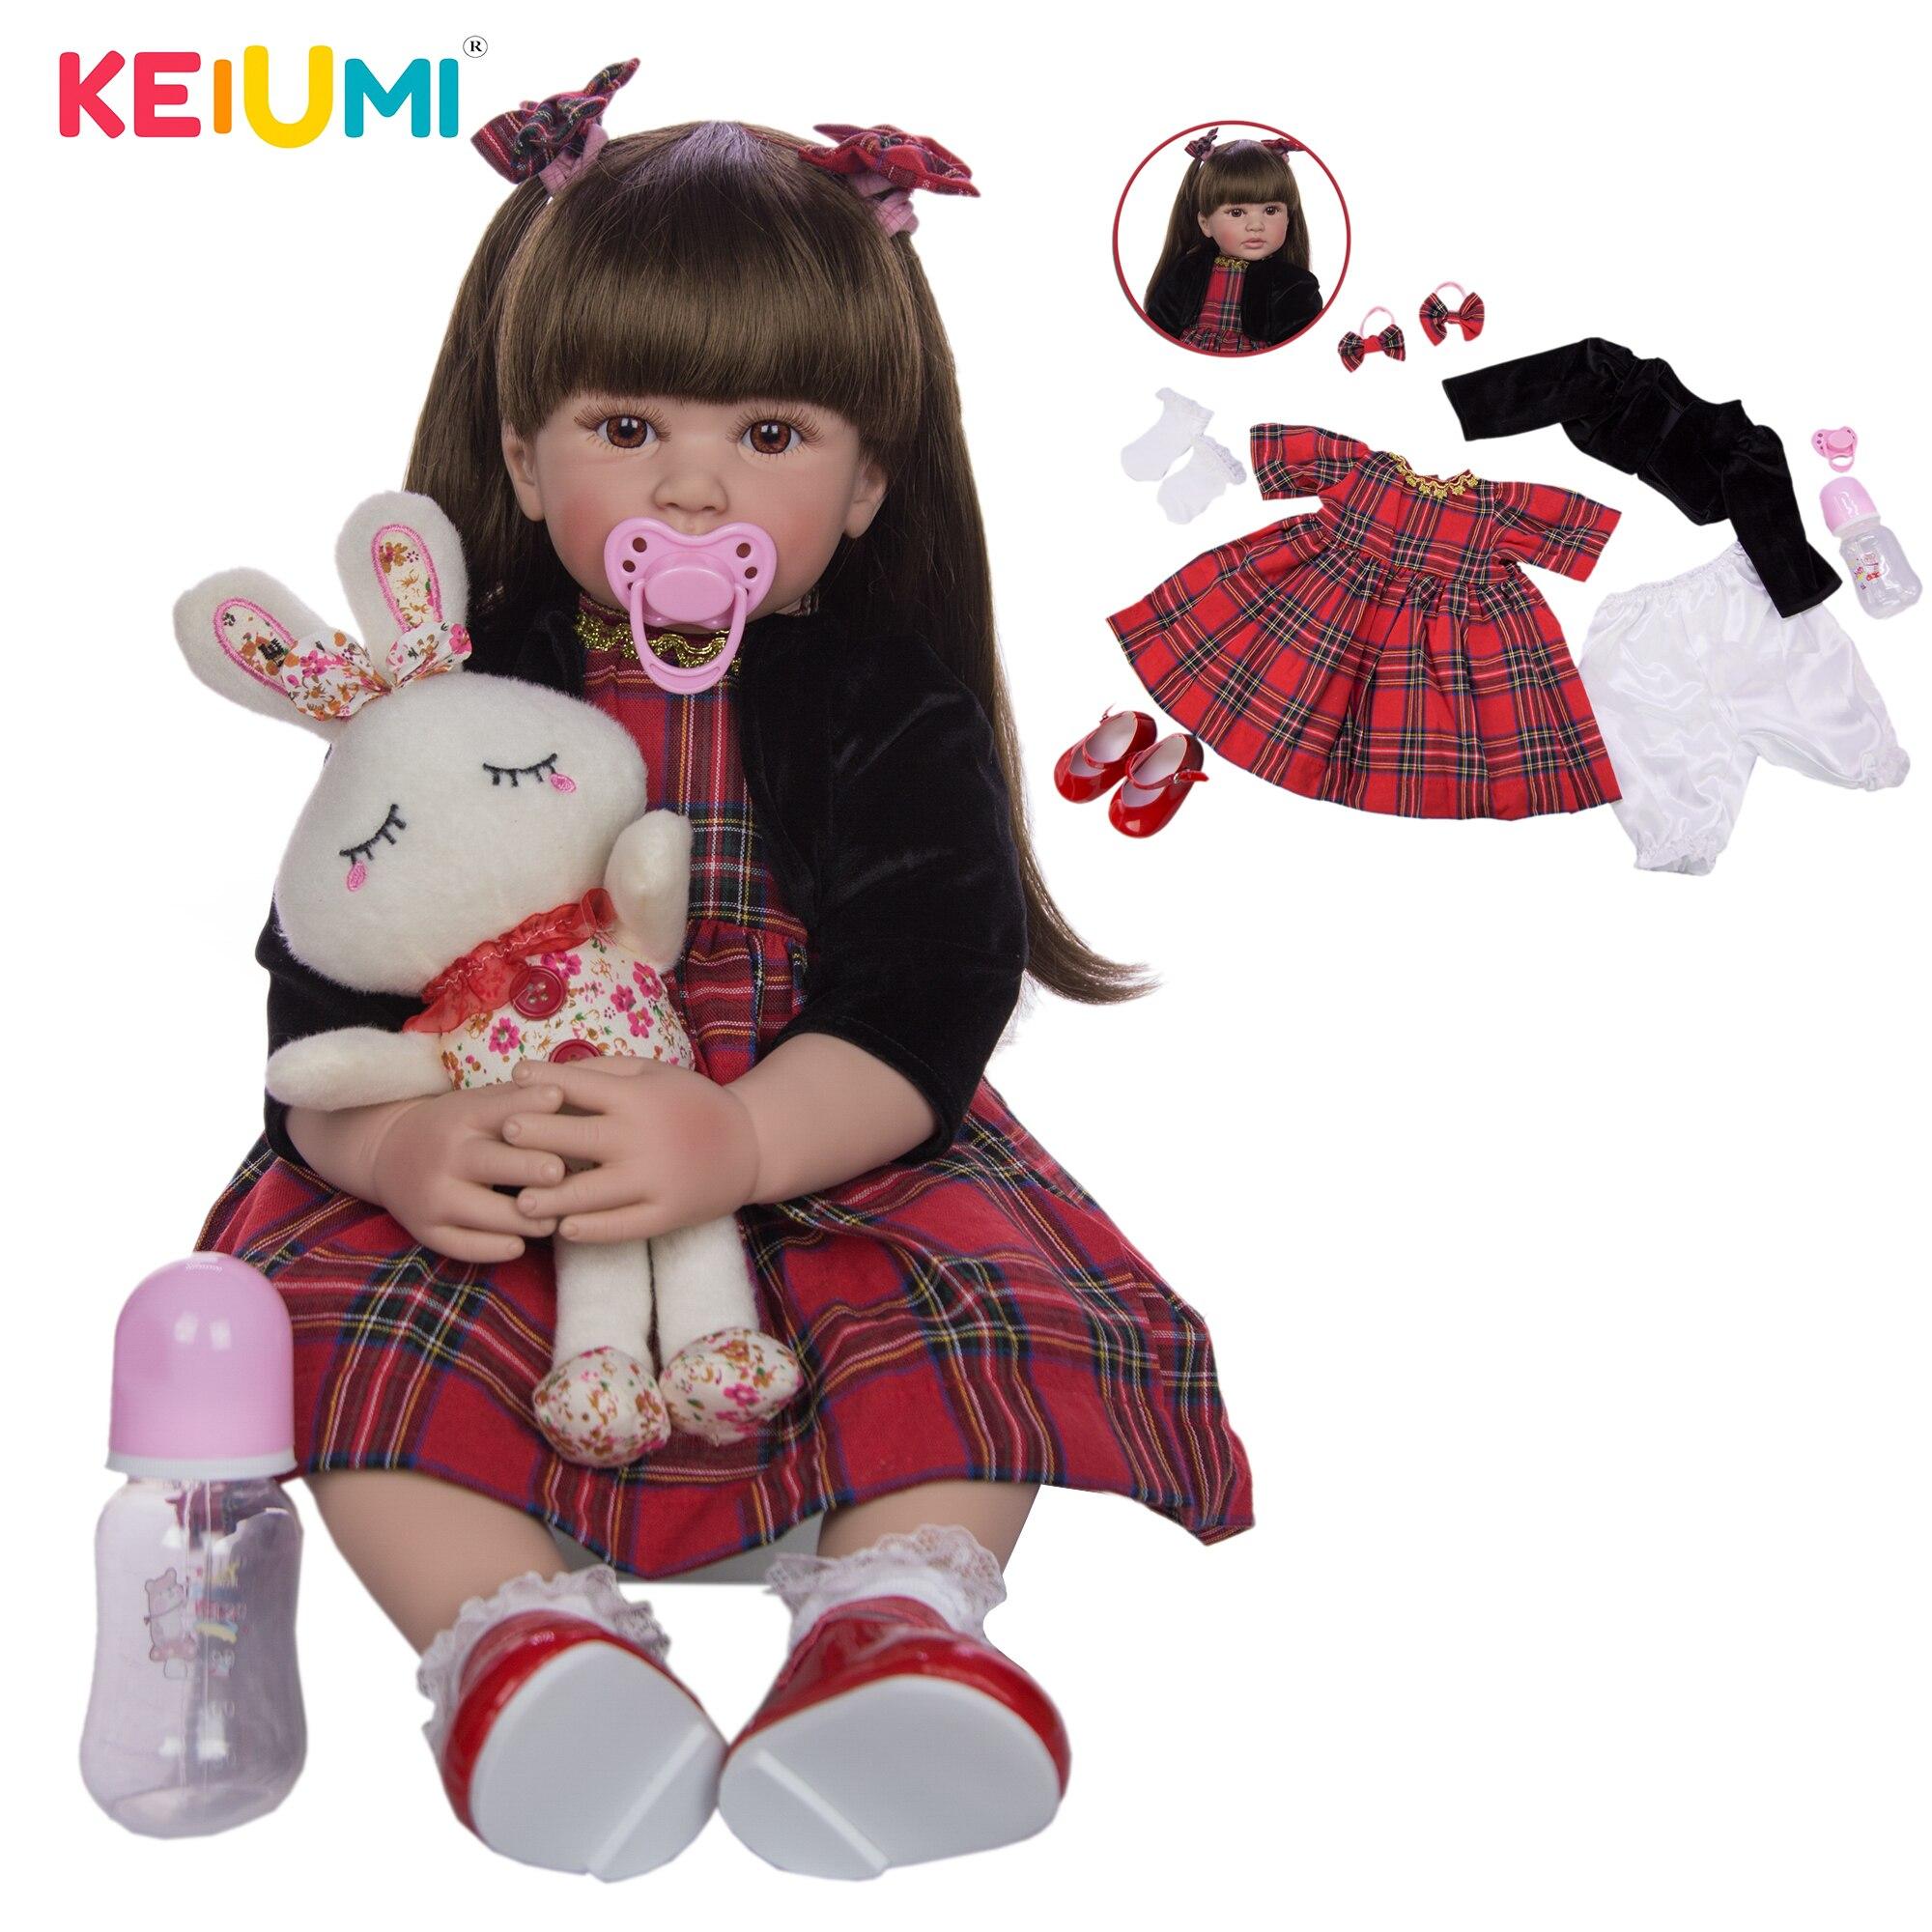 KEIUMI 24 Inch Reborn Dolls 60 cm Silicone Soft Realistic Princess Girl Baby Doll For Sale Ethnic Doll Kid Birthday Xmas Gifts(China)